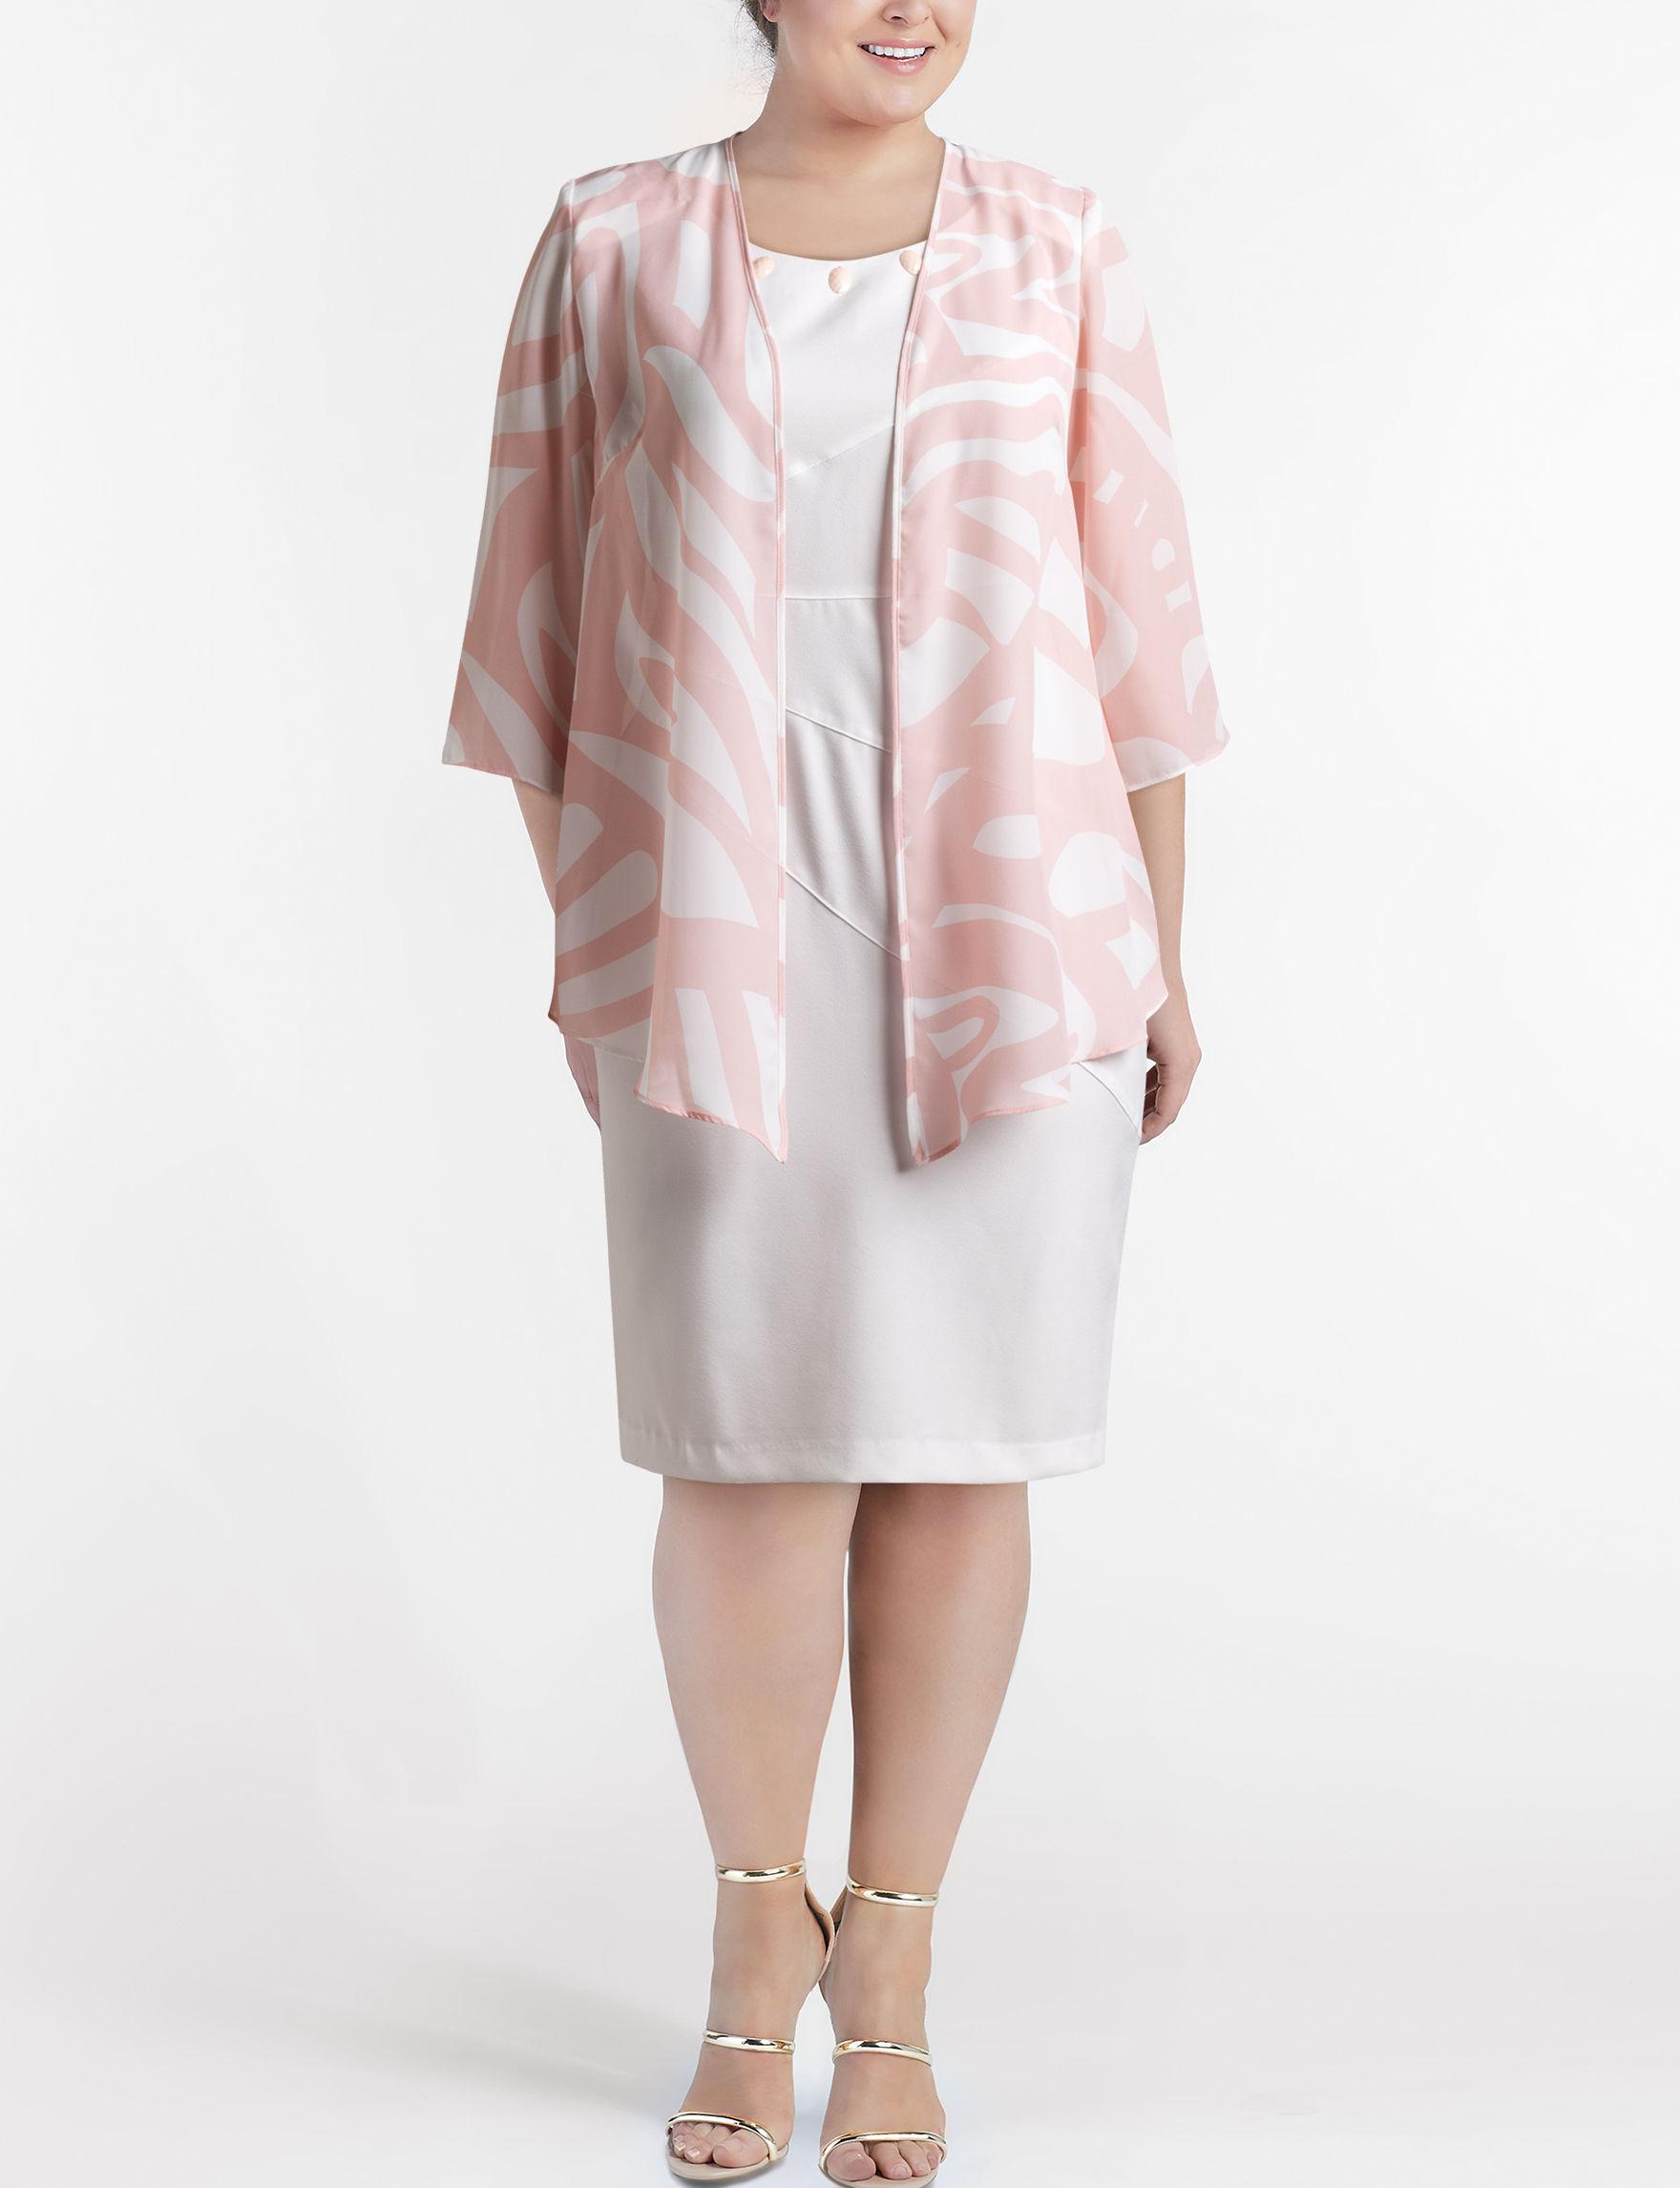 Maya Brooke White / Pink Everyday & Casual Jacket Dresses